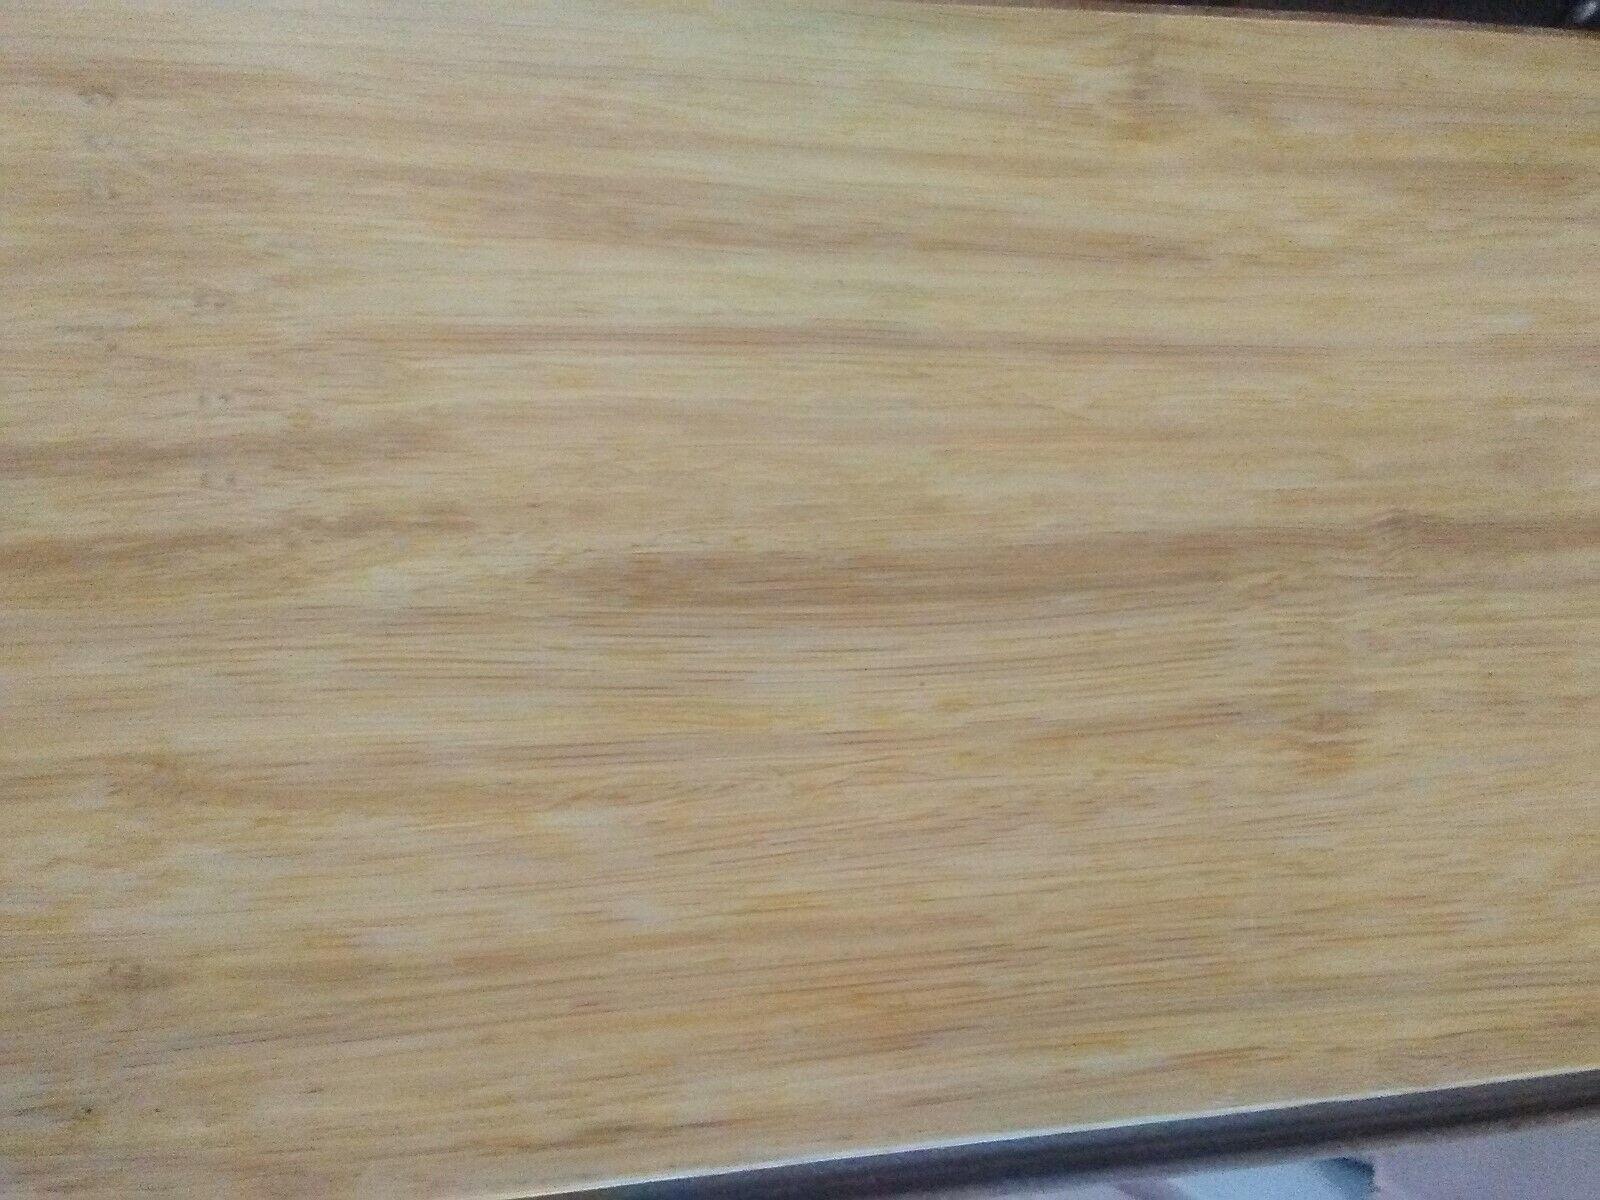 CLICK ENGINEERED STRAND WOVEN BAMBOO FLOORING - NATURAL - $1